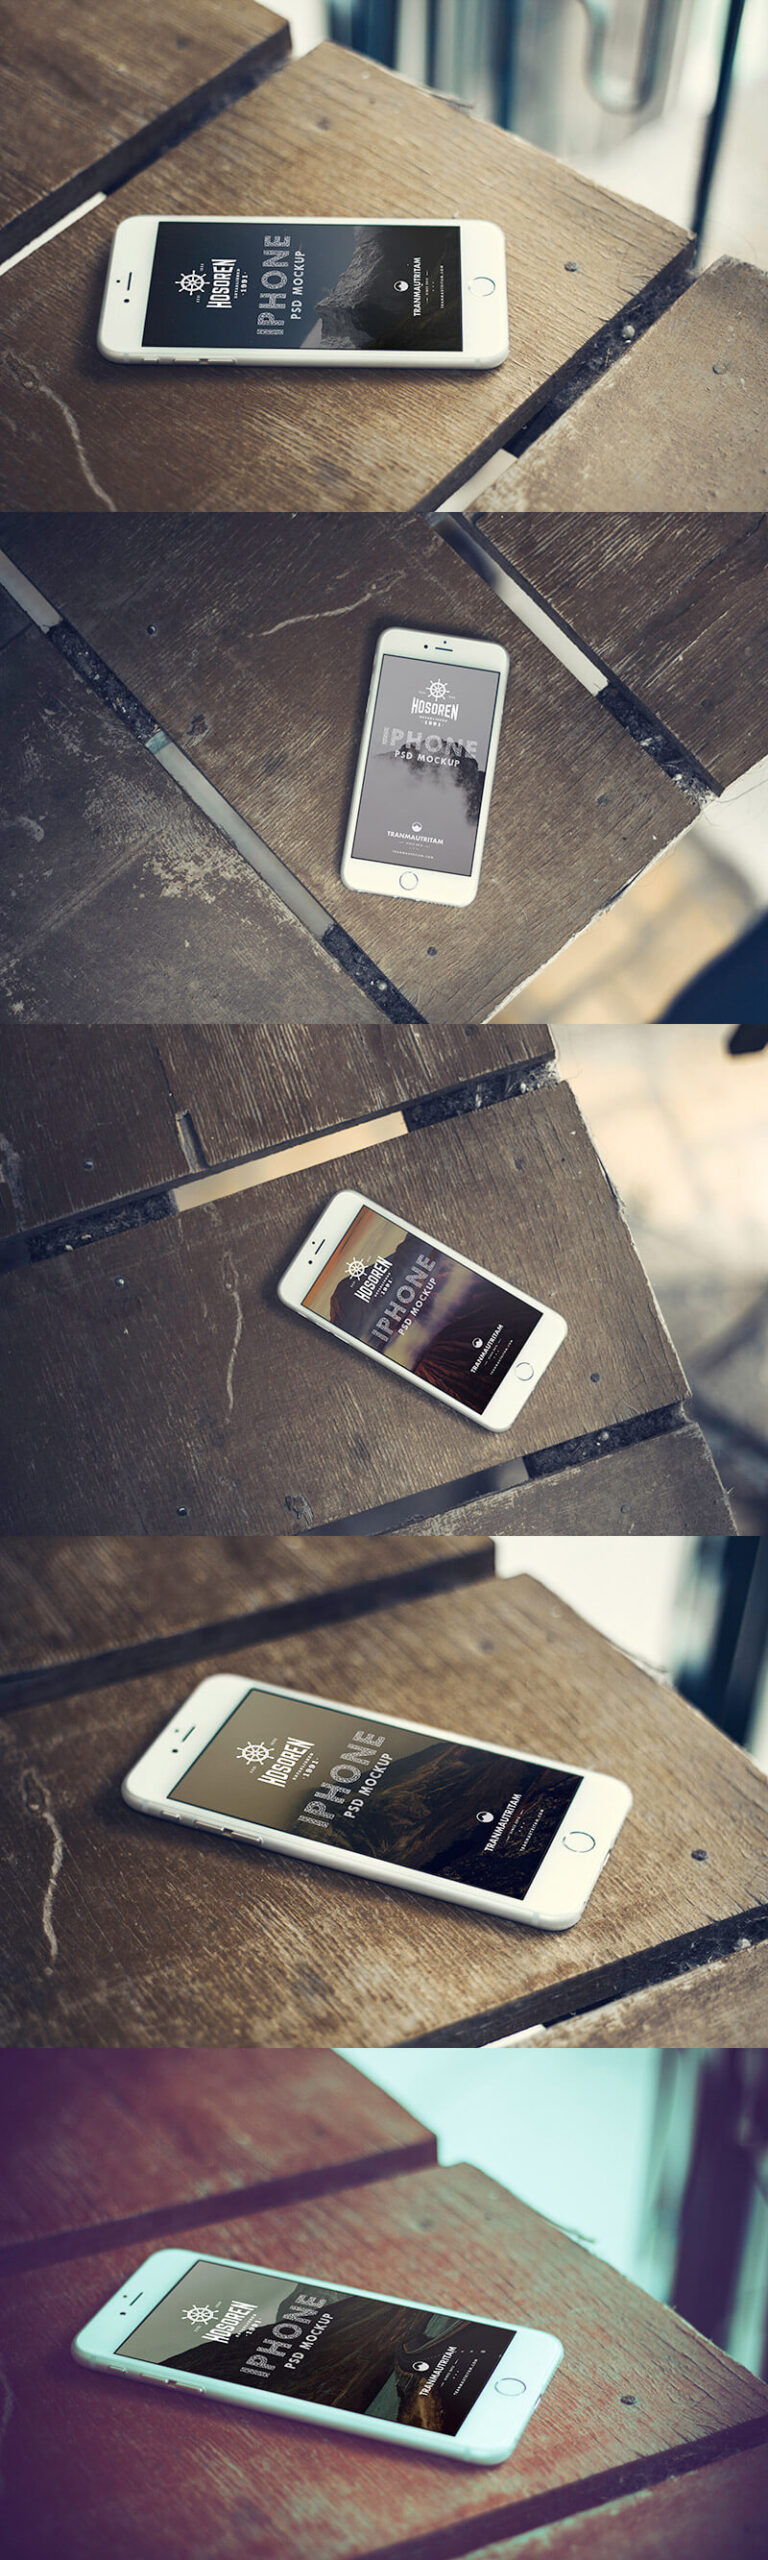 Free 10 iPhone 6 Mockups PSD Template3